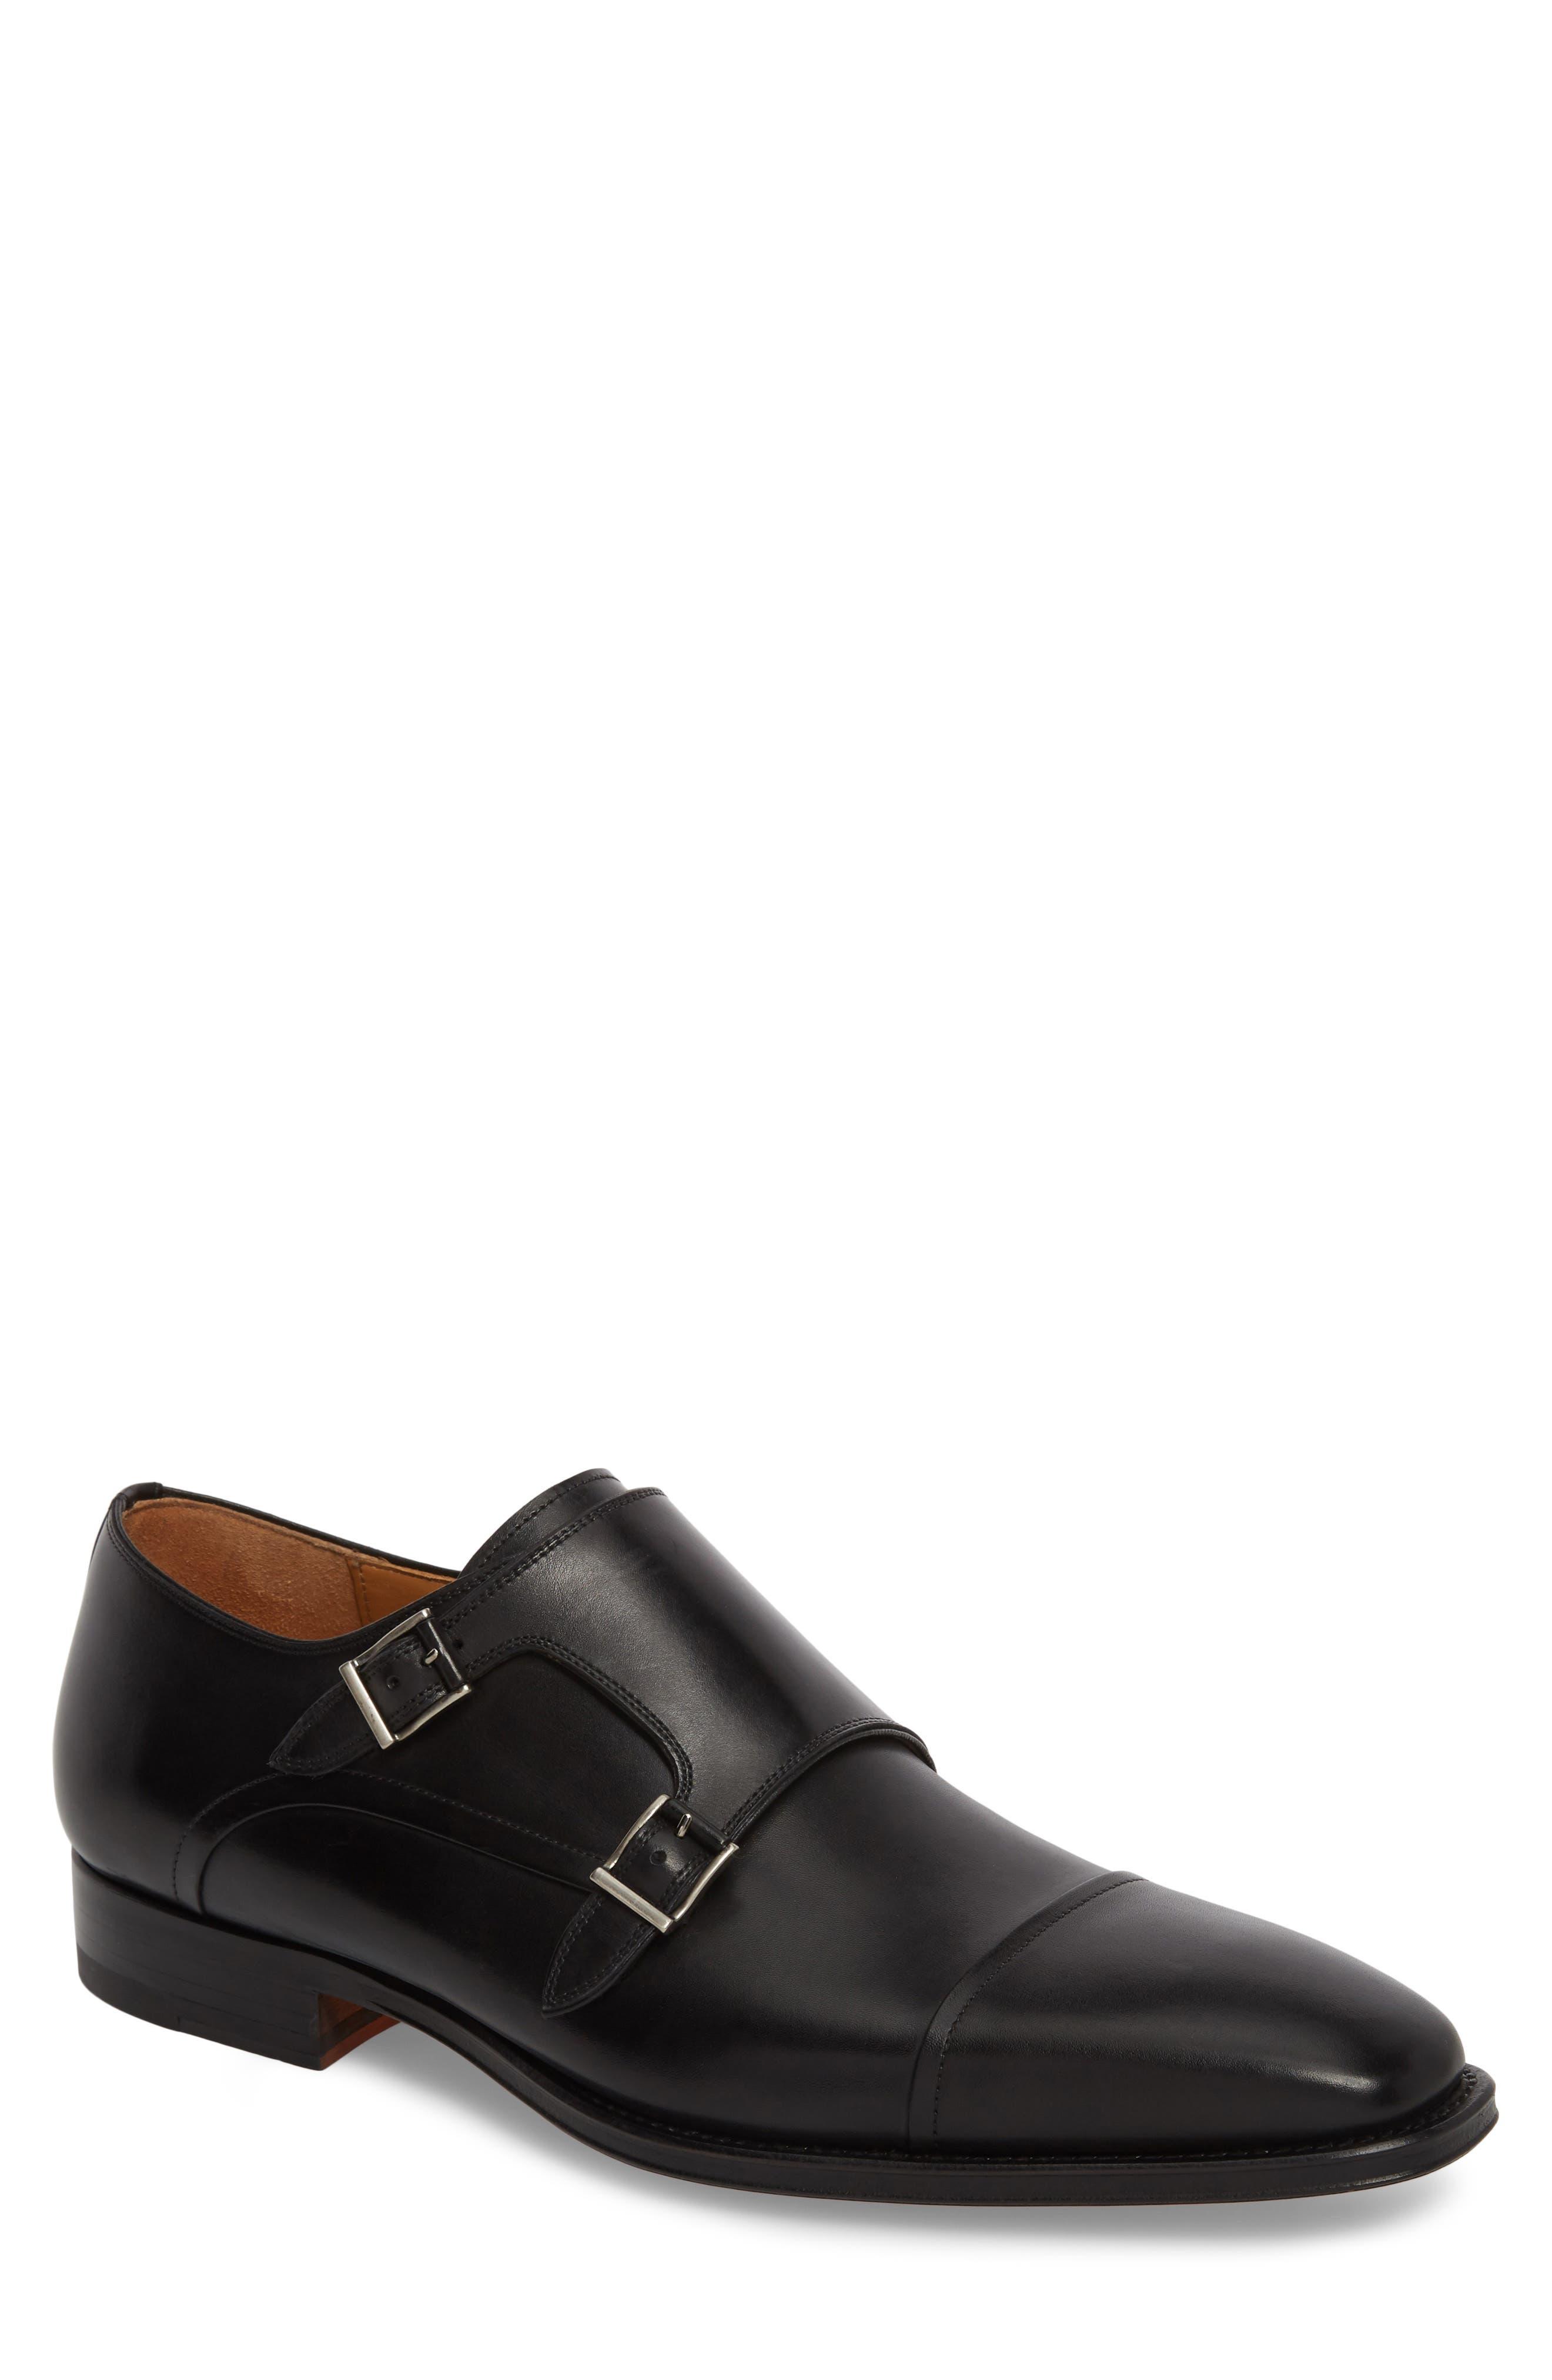 Silvio Double Monk Strap Shoe,                         Main,                         color, Black Leather